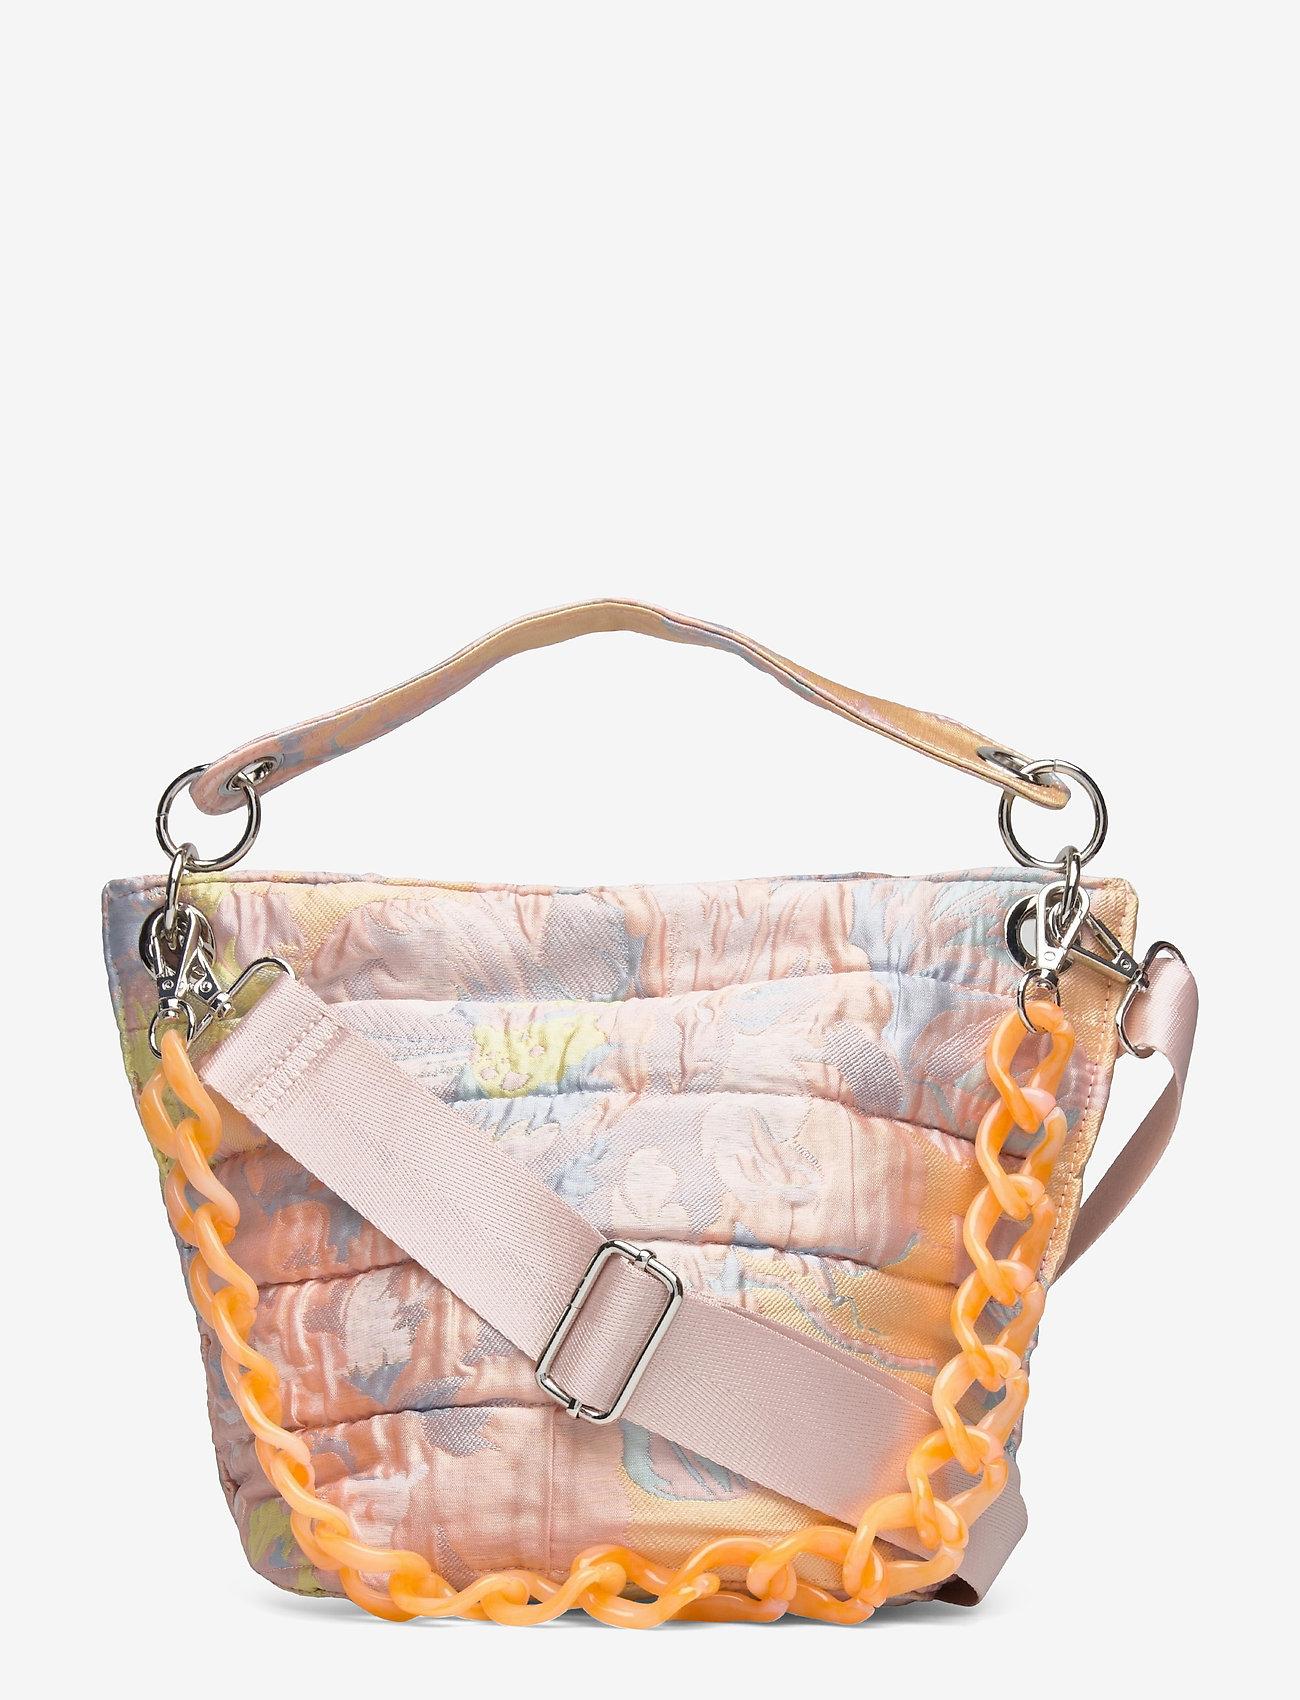 HVISK - NEAT DREAMY - bucket-laukut - peach - 1